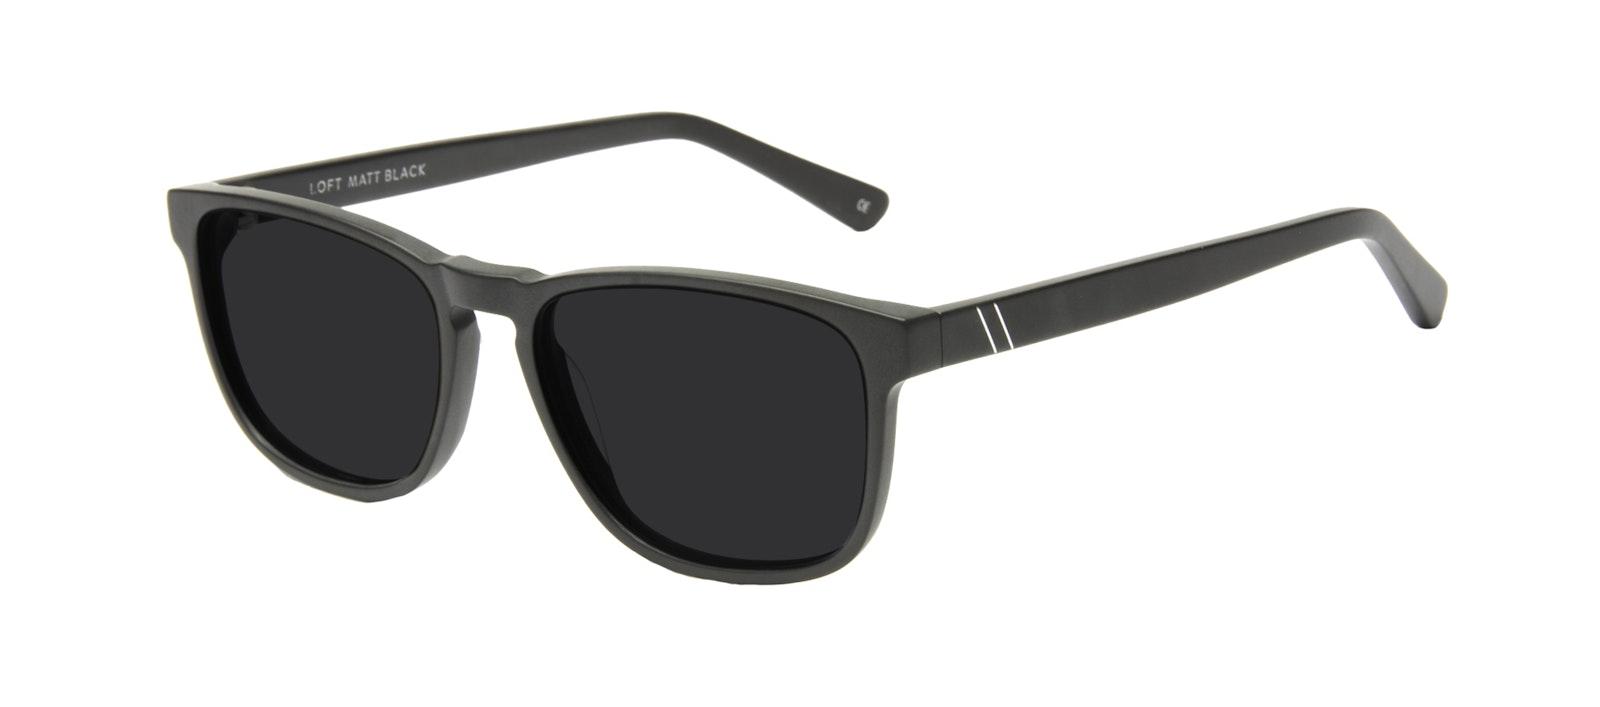 Affordable Fashion Glasses Rectangle Sunglasses Men Loft Black Matte Tilt